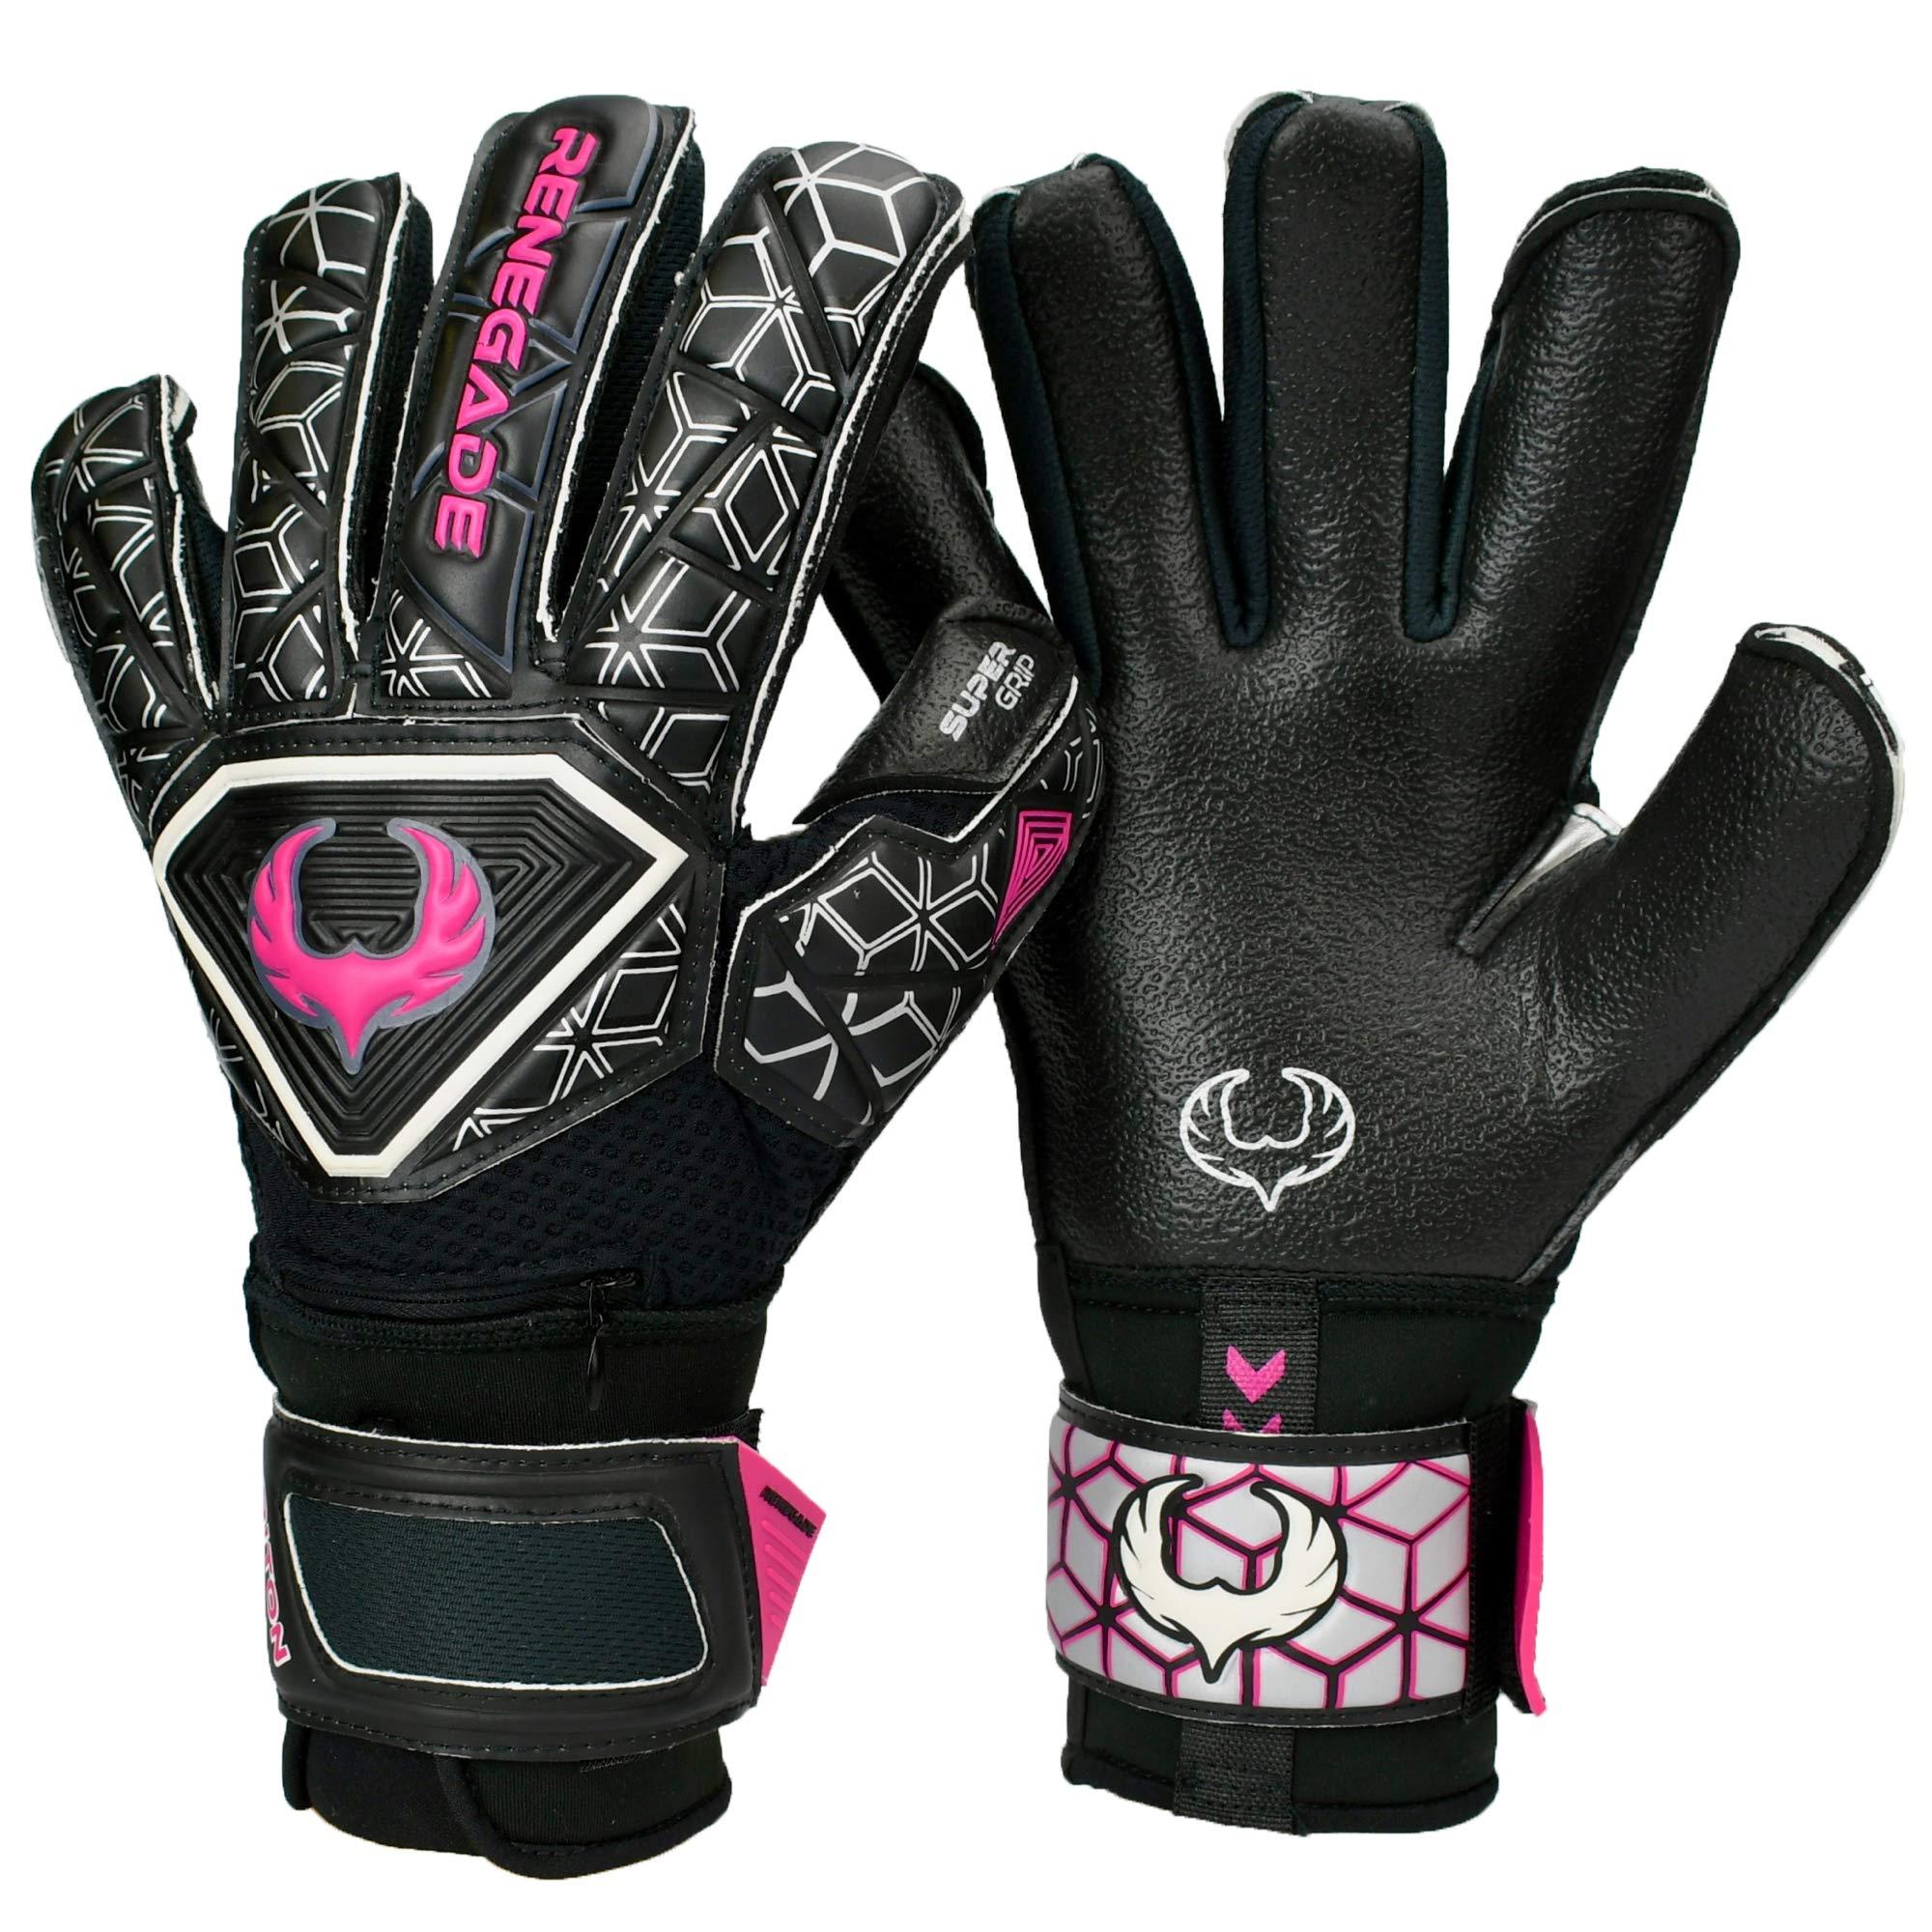 Renegade GK Triton Frenzy Hybrid Cut Level 2 Adult & Kids Goalkeeper Gloves with Fingersaves - Kids Goalie Gloves Size 5 - Soccer Goalie Gloves for Kids - Youth Golie Gloves Black & Pink/Purple